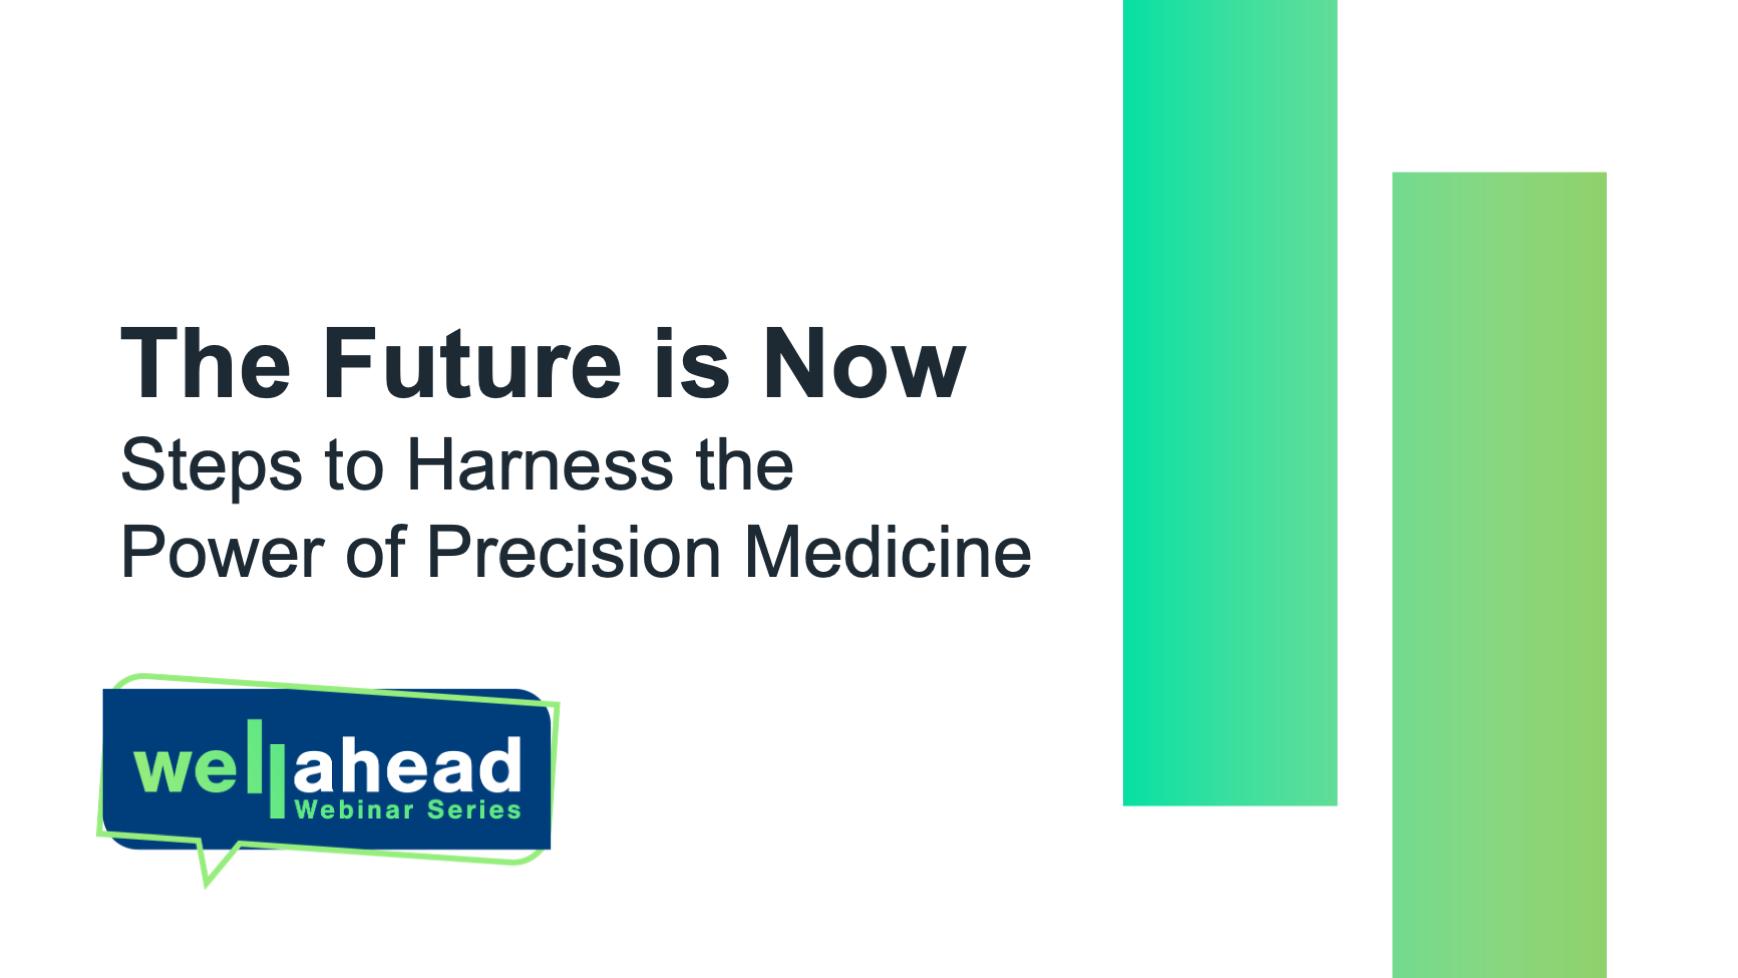 WellAhead Webinar - Precision Medicine PPT Cover